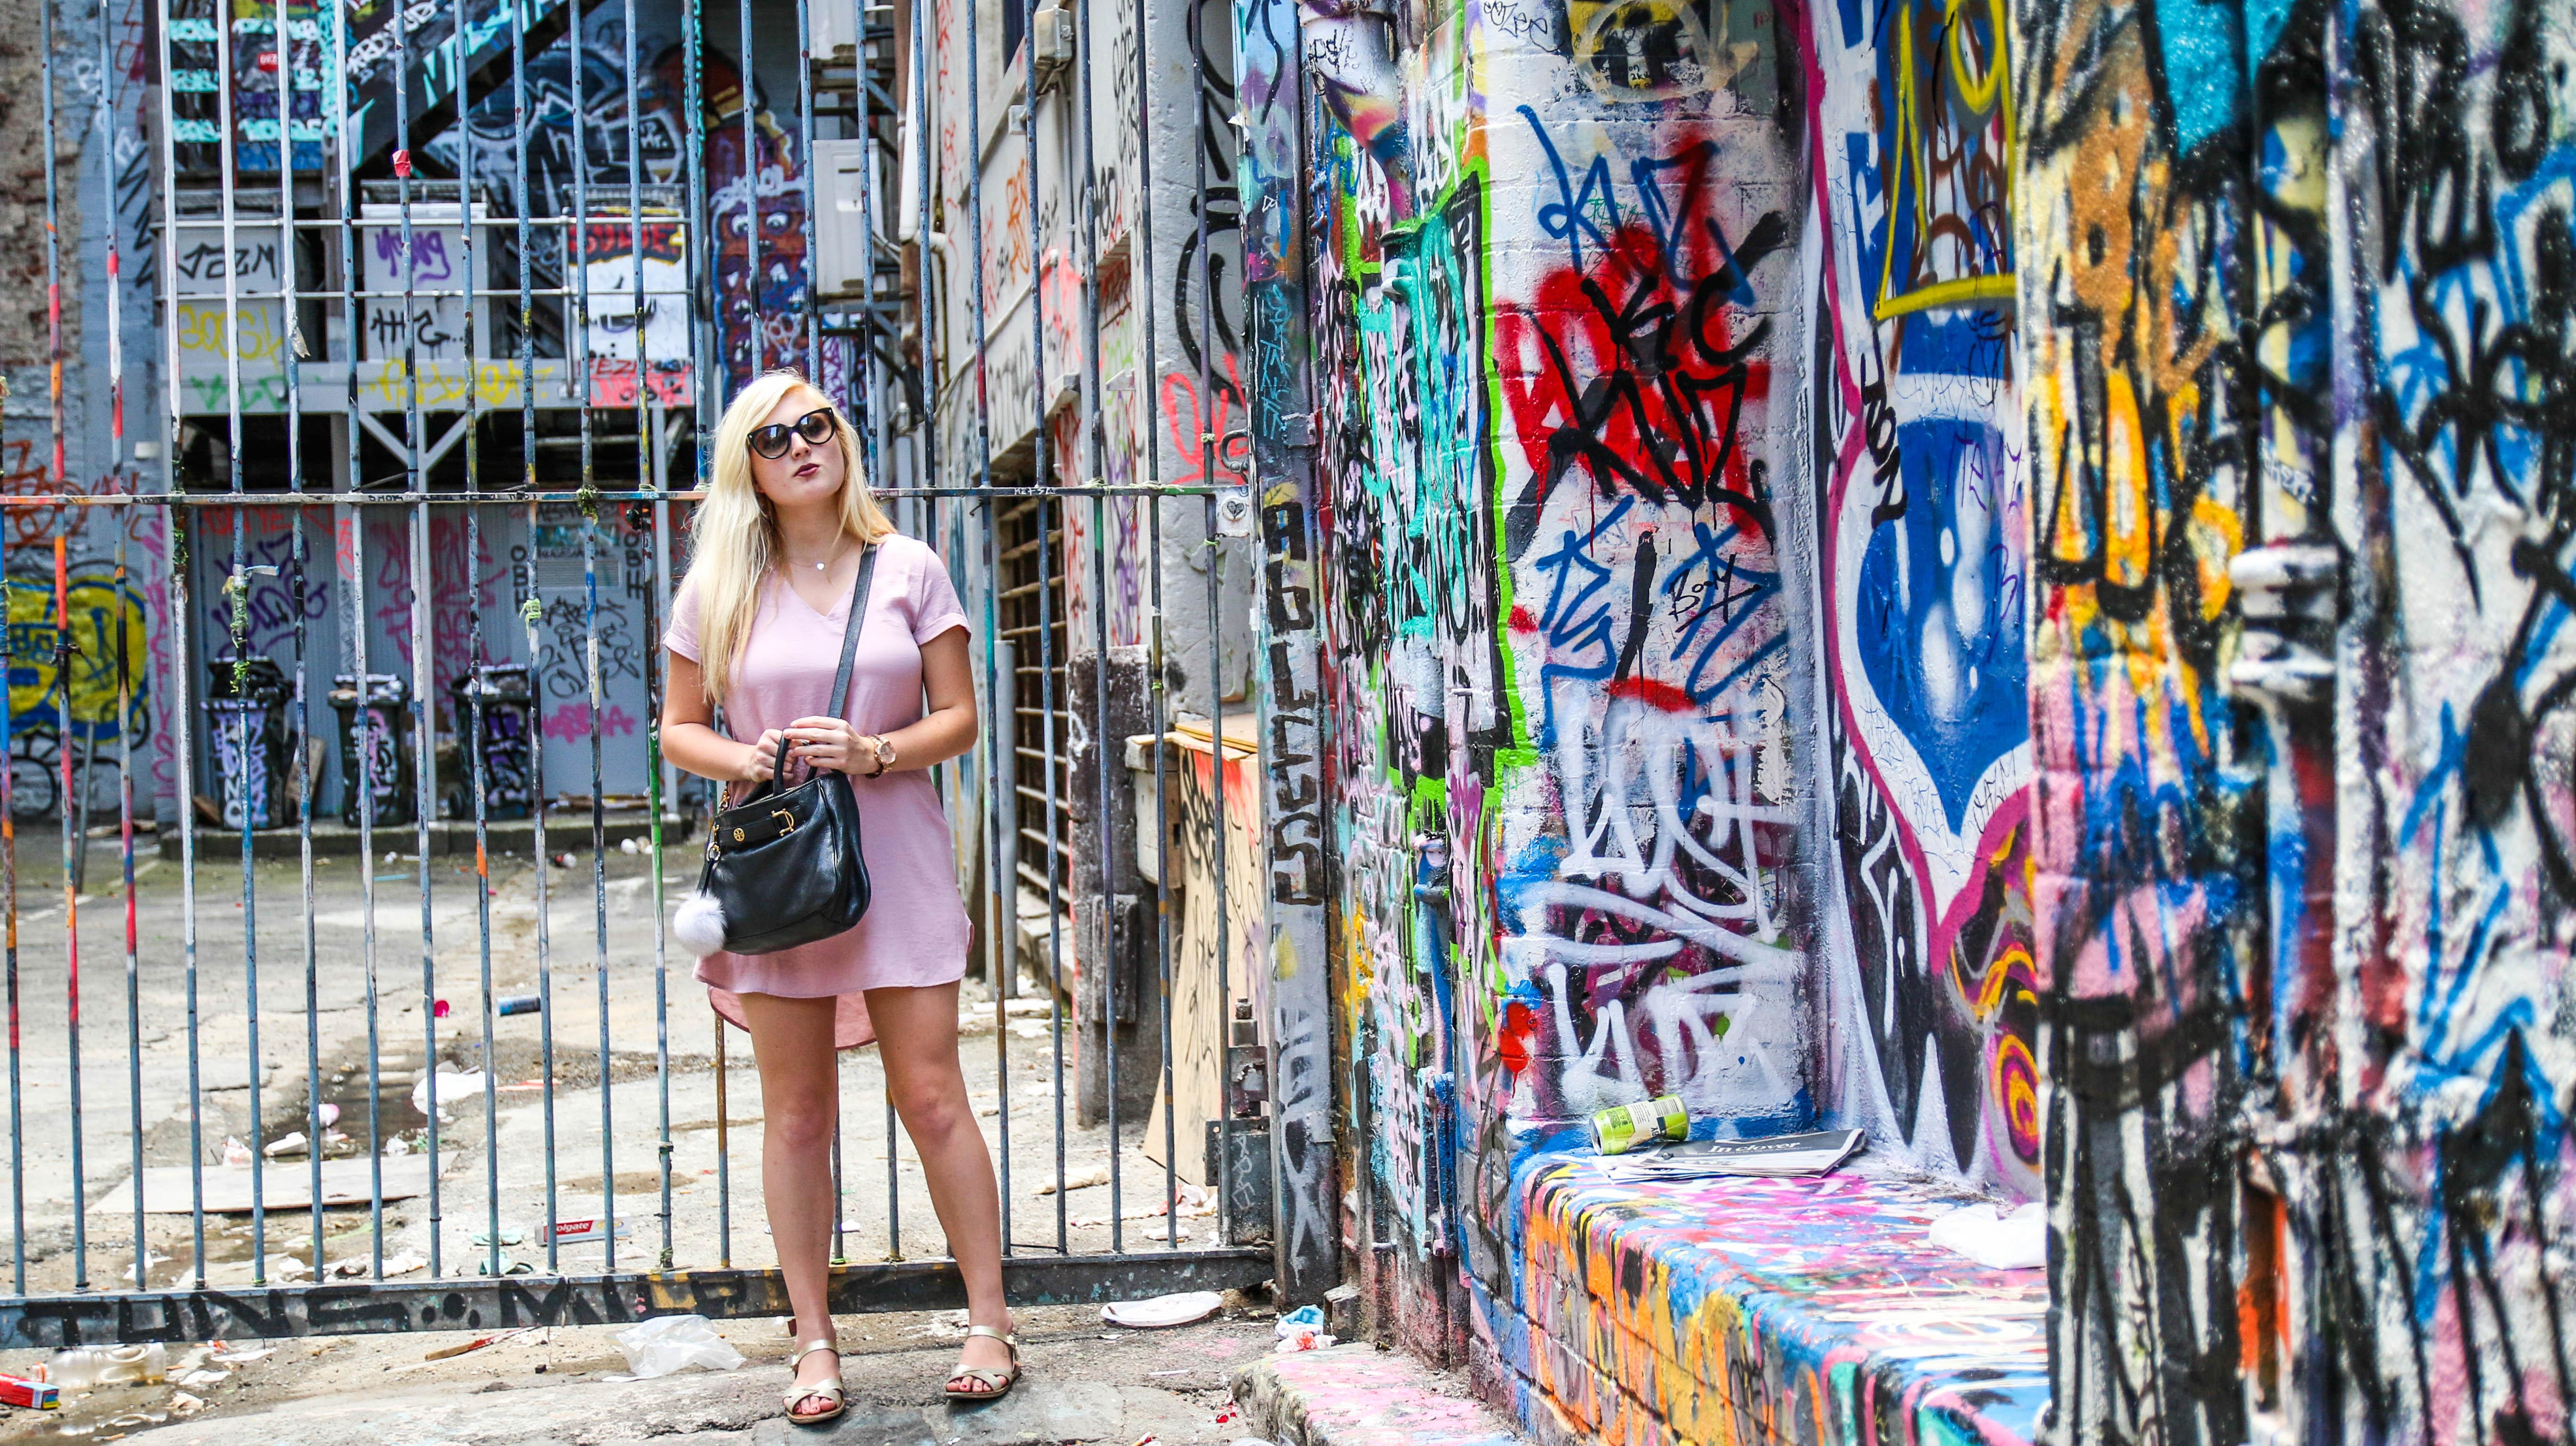 Brianna de Gaston in Hosier Lane Graffiti - JamesWatling KiwiPassport.com